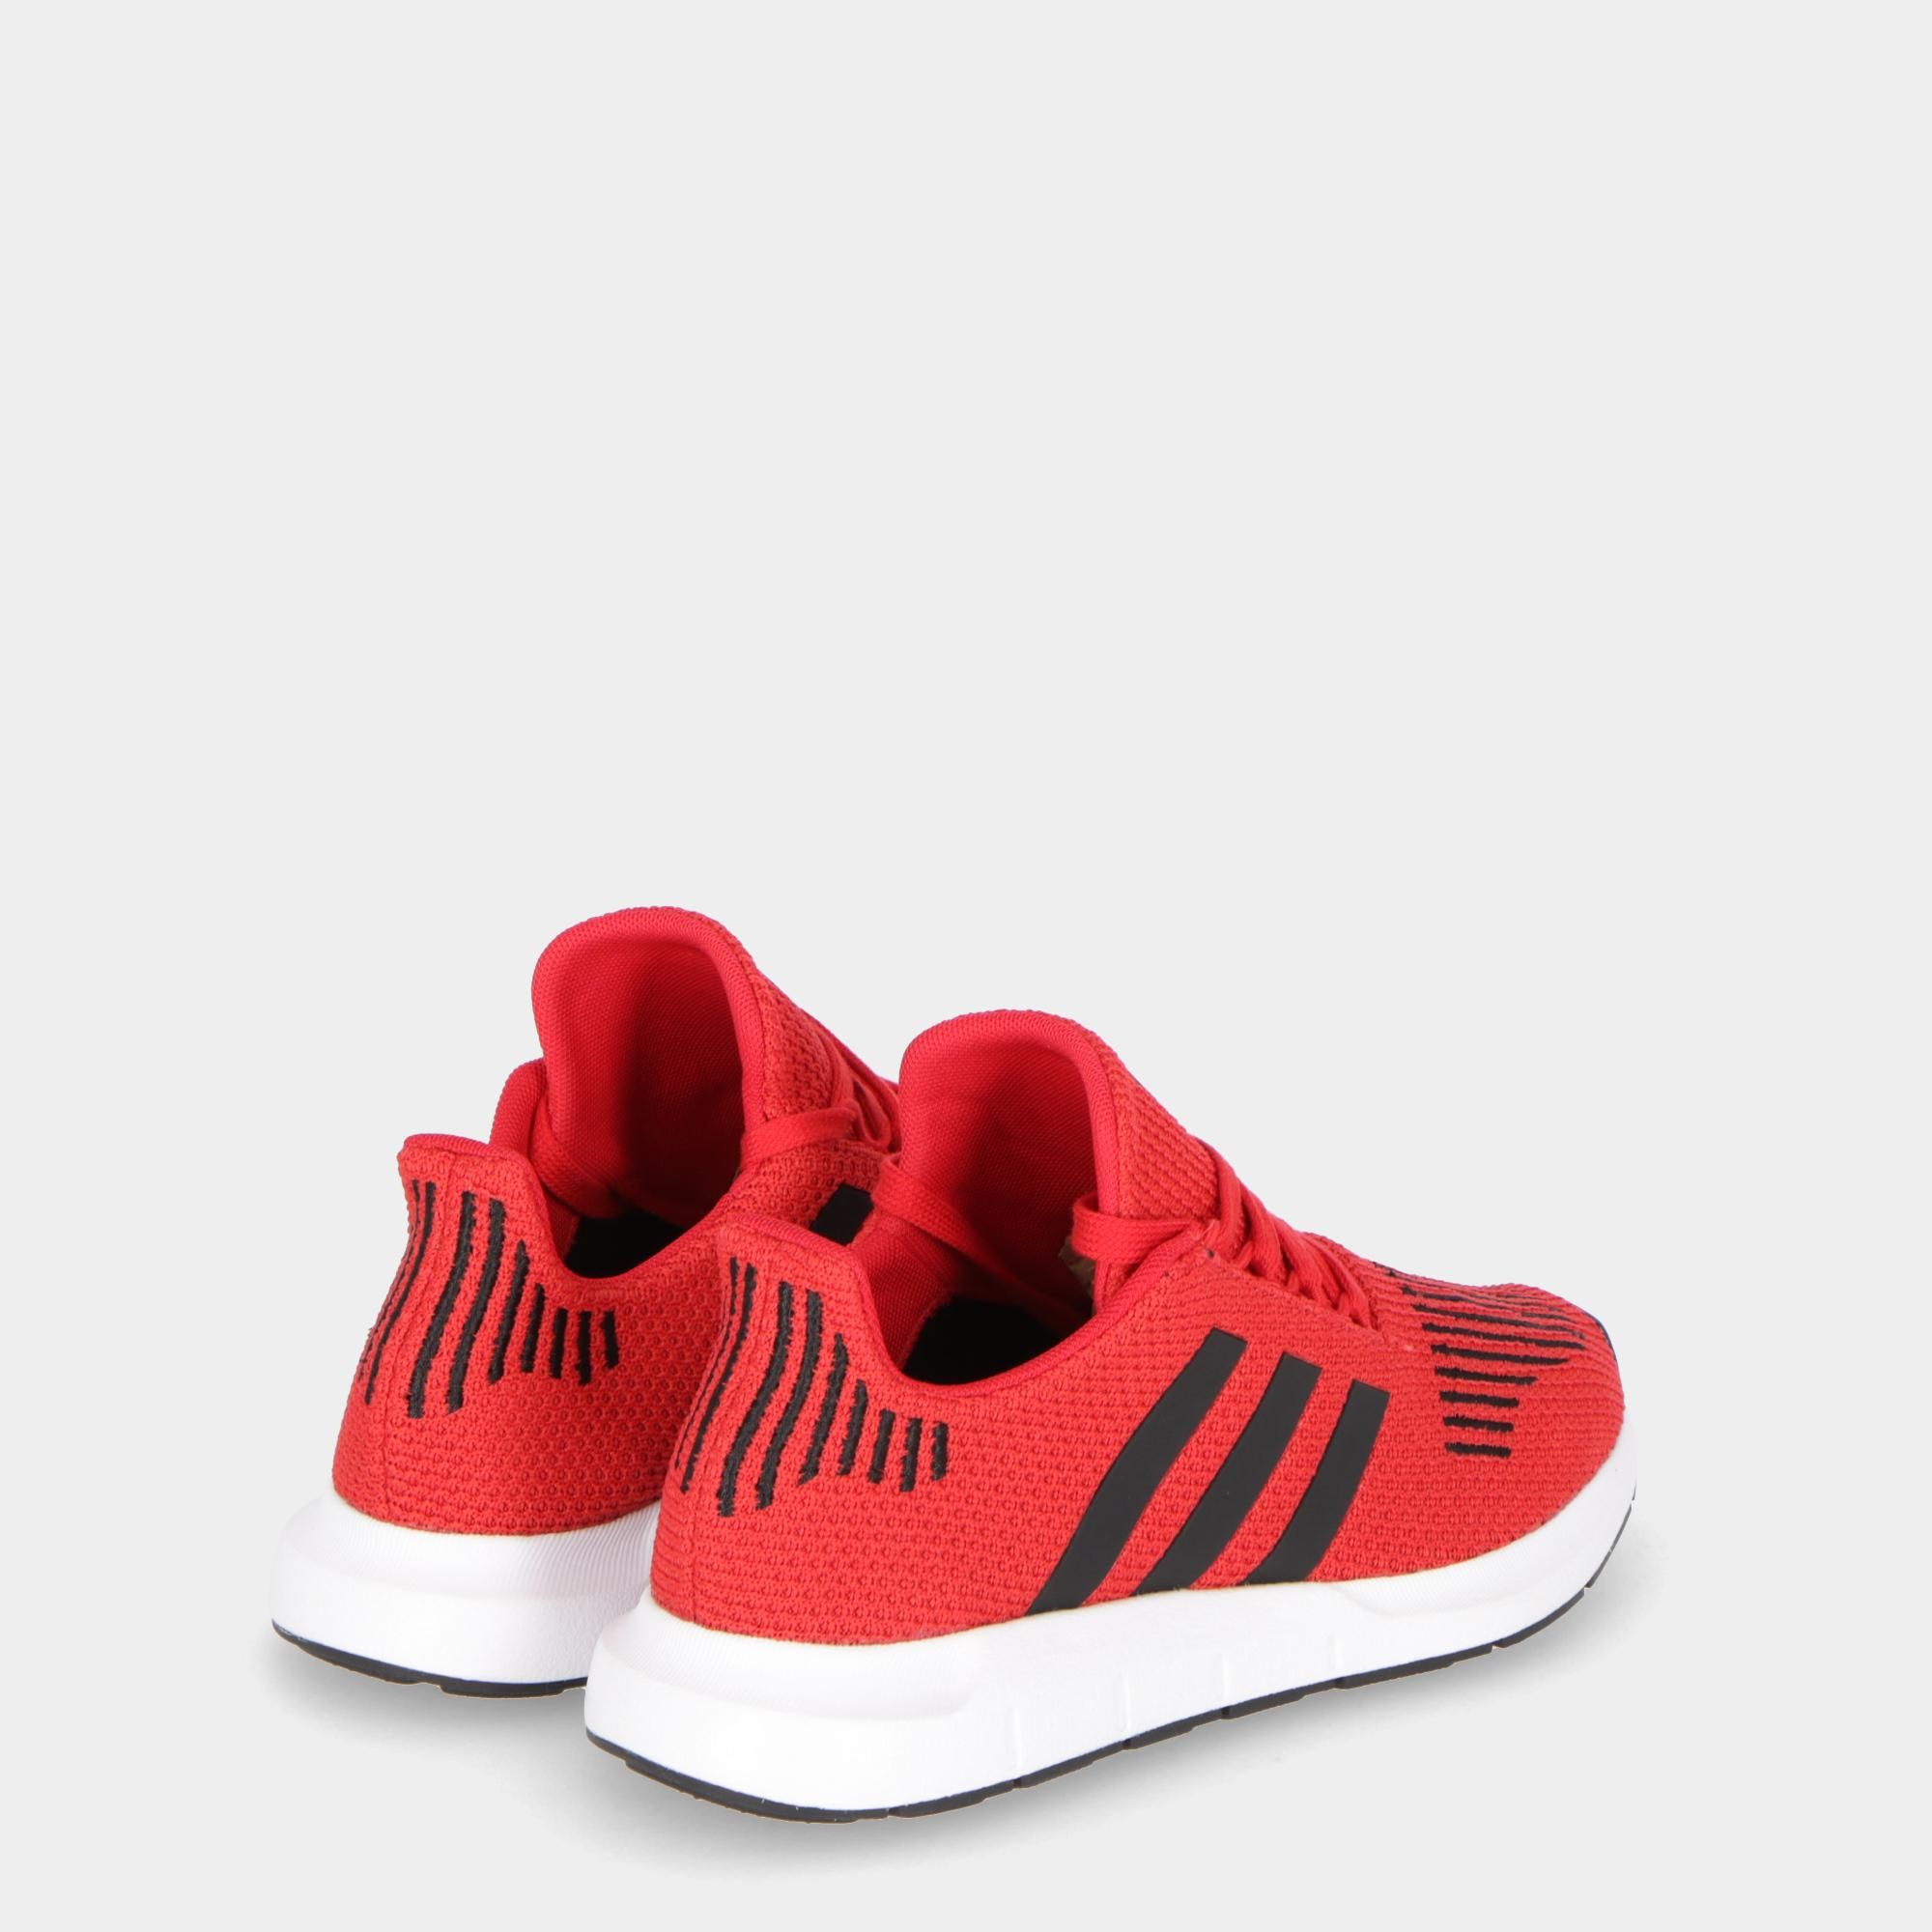 850d94ad5d0037 Adidas Swift Run - Kids Scarlet Black White